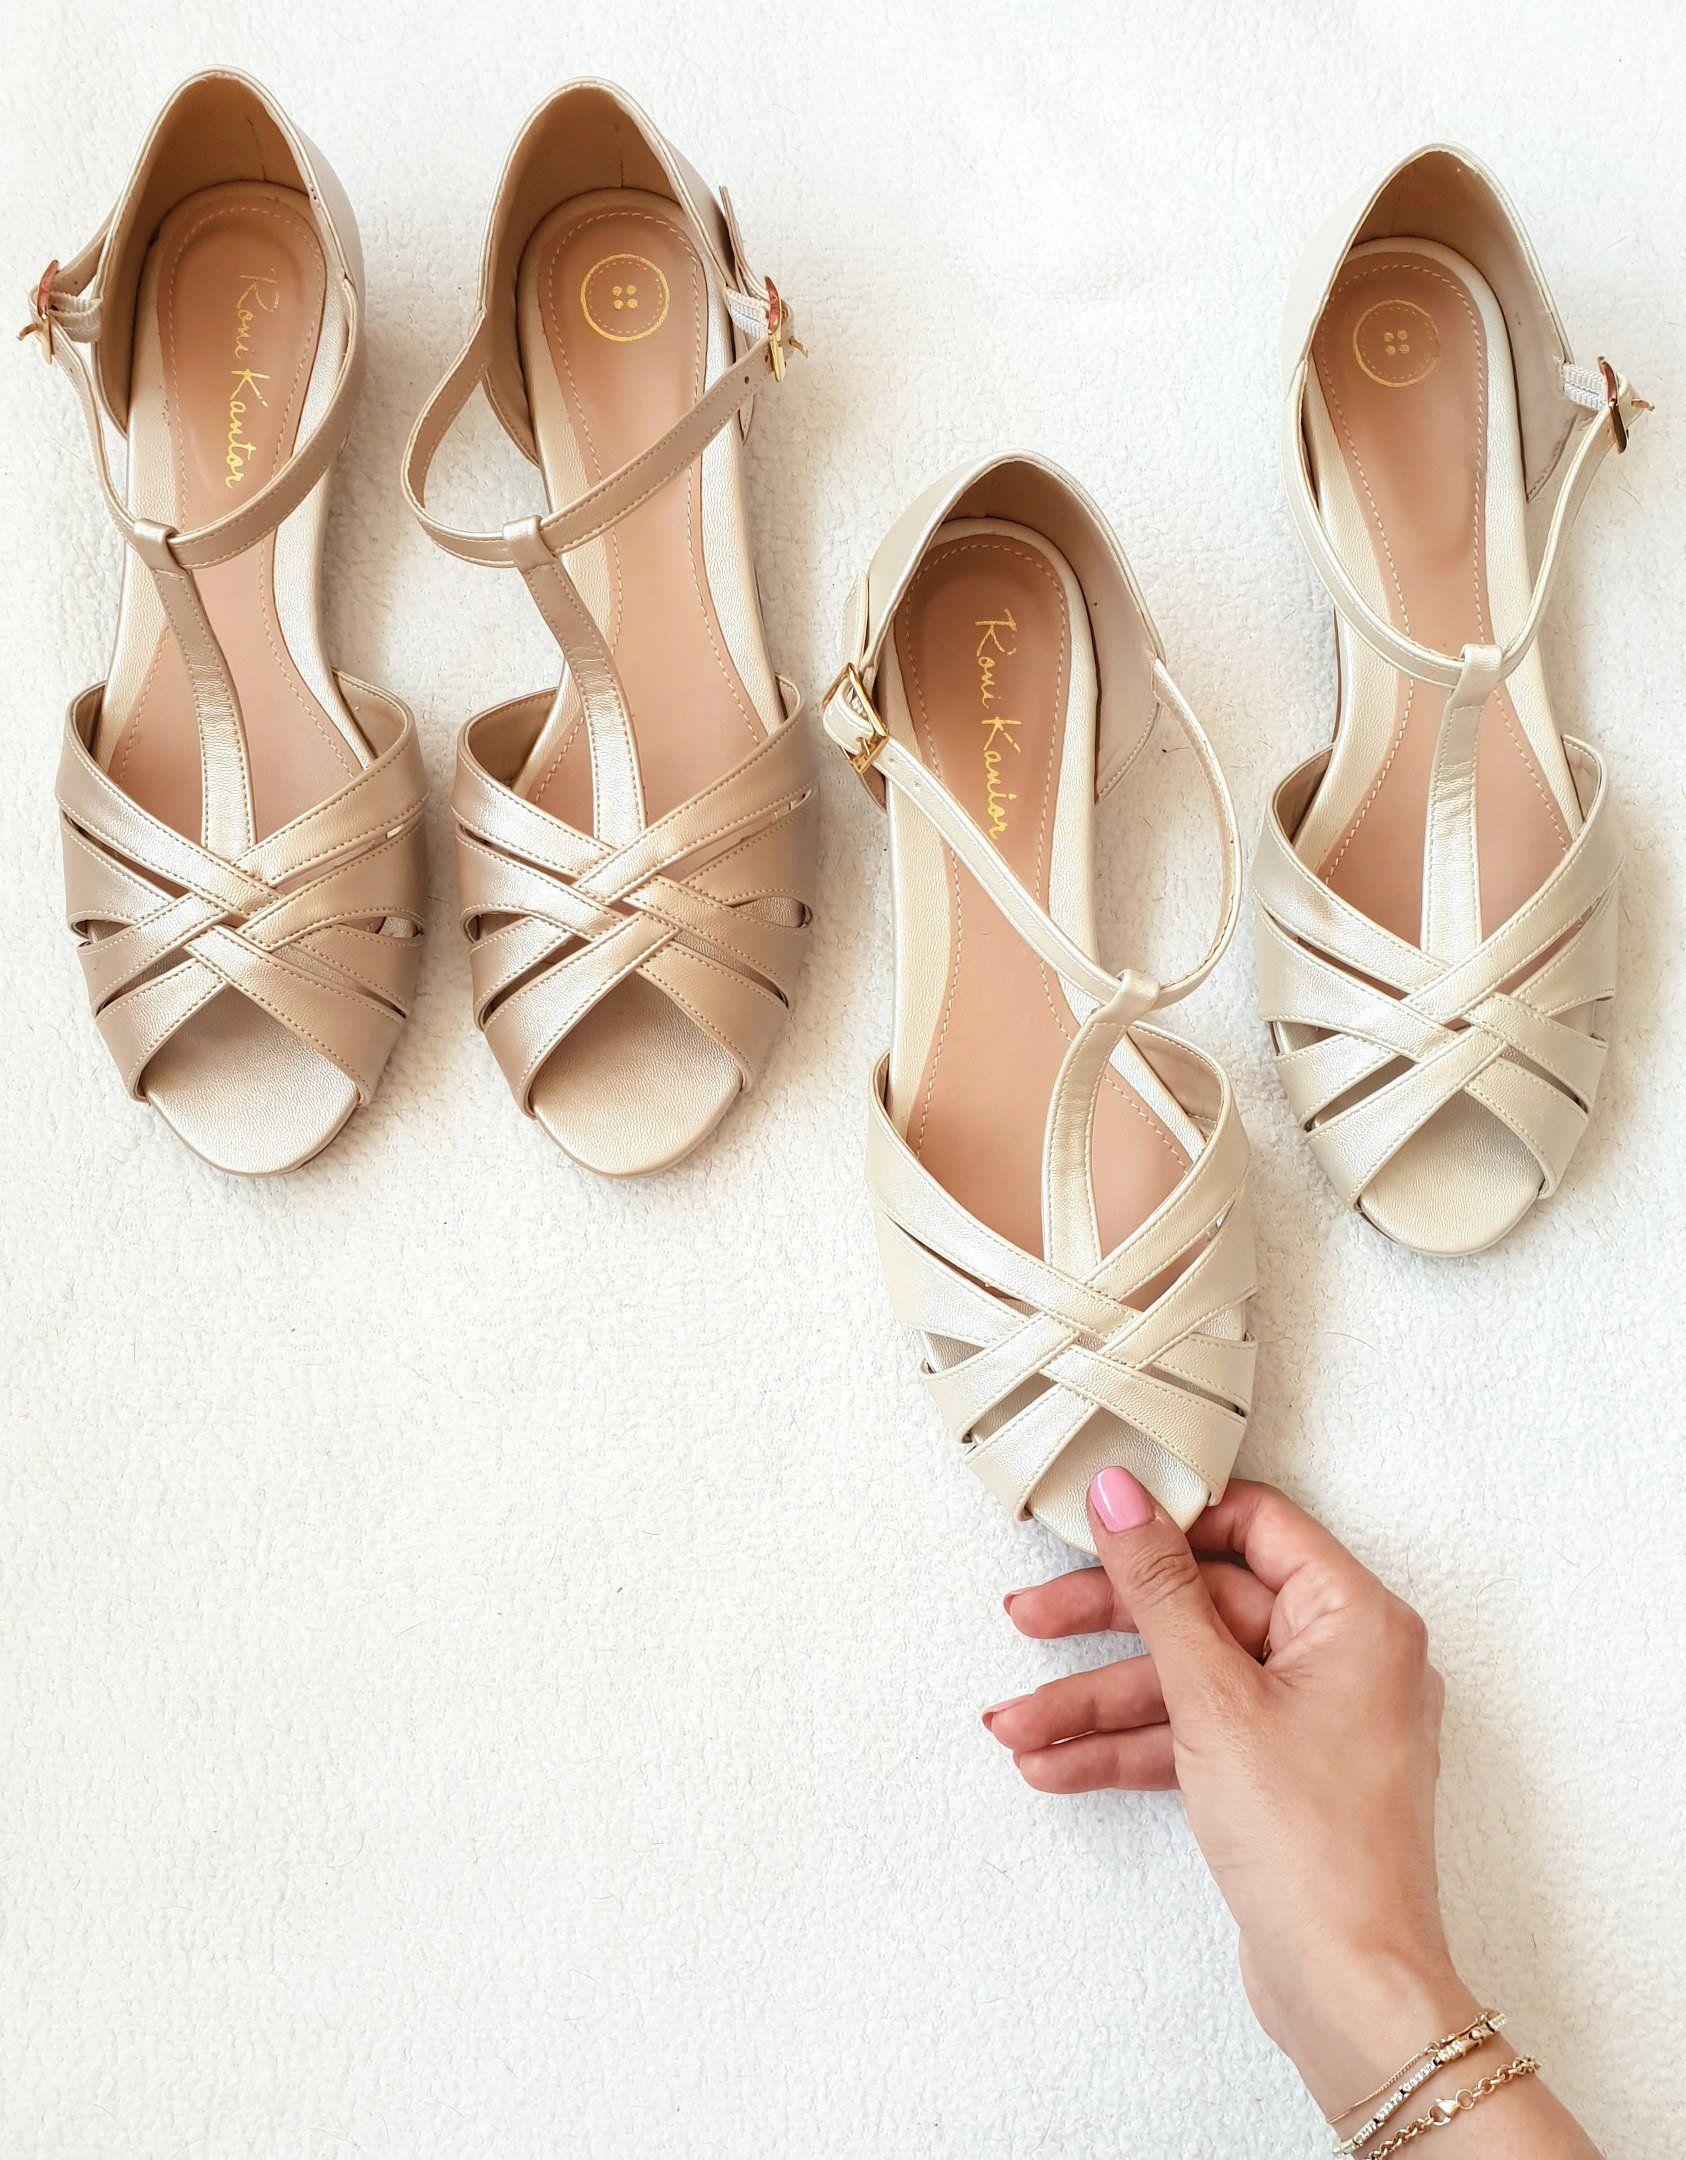 Shila Vegan Champagne Bridal Vintage Inspired Kitten Heel Etsy In 2020 Wedding Shoes Heels Wedding Shoes Low Heel Bridal Shoes